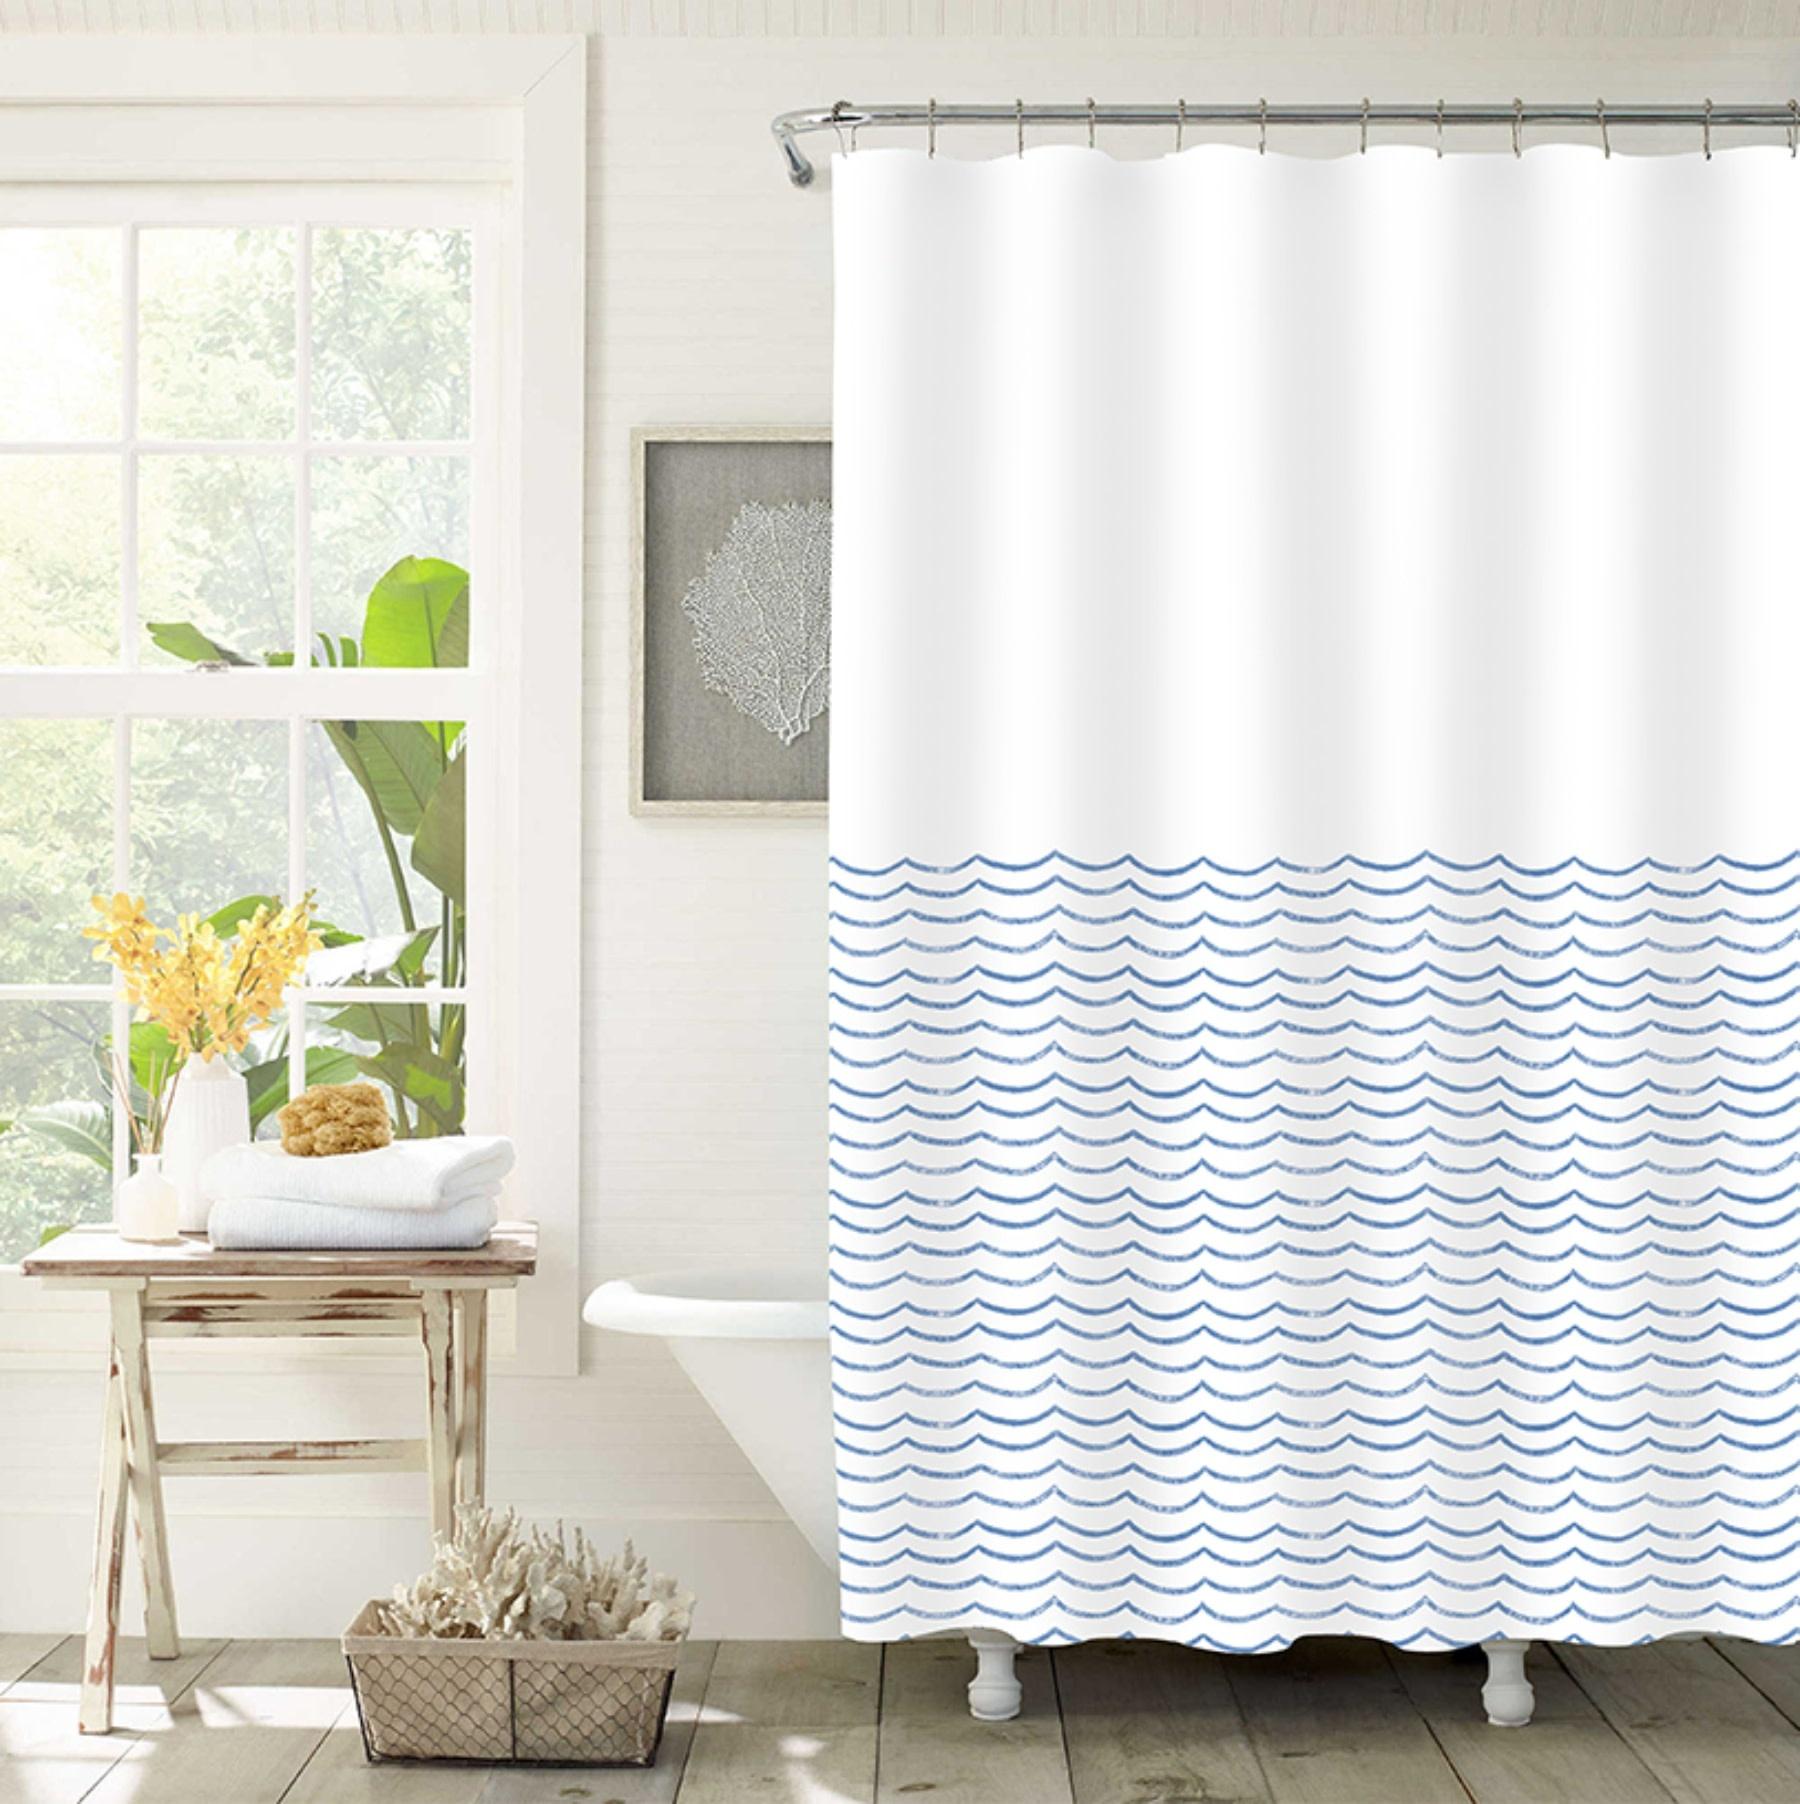 lauren taylor waves shower curtain ast 70x72 mp12